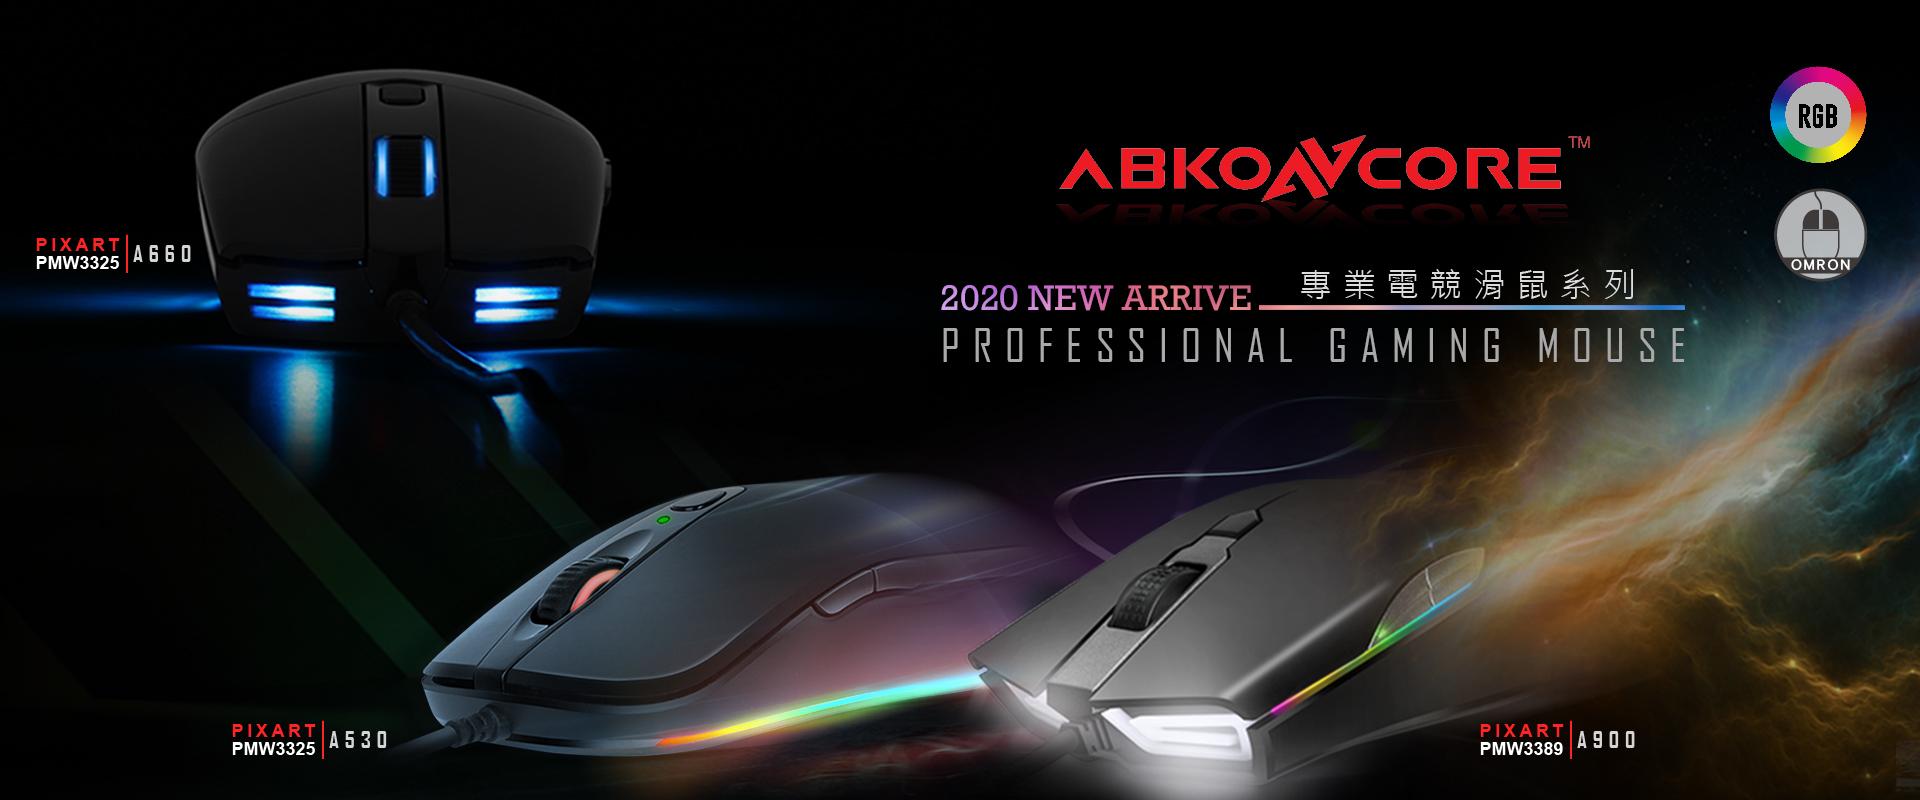 ABKONCORE,電競滑鼠,3325,歐姆龍開關,電競滑鼠推薦,樂維科技,韓國電競品牌,RGB滑鼠,6段DPI滑鼠,32位元MCU滑鼠,人體工學滑鼠